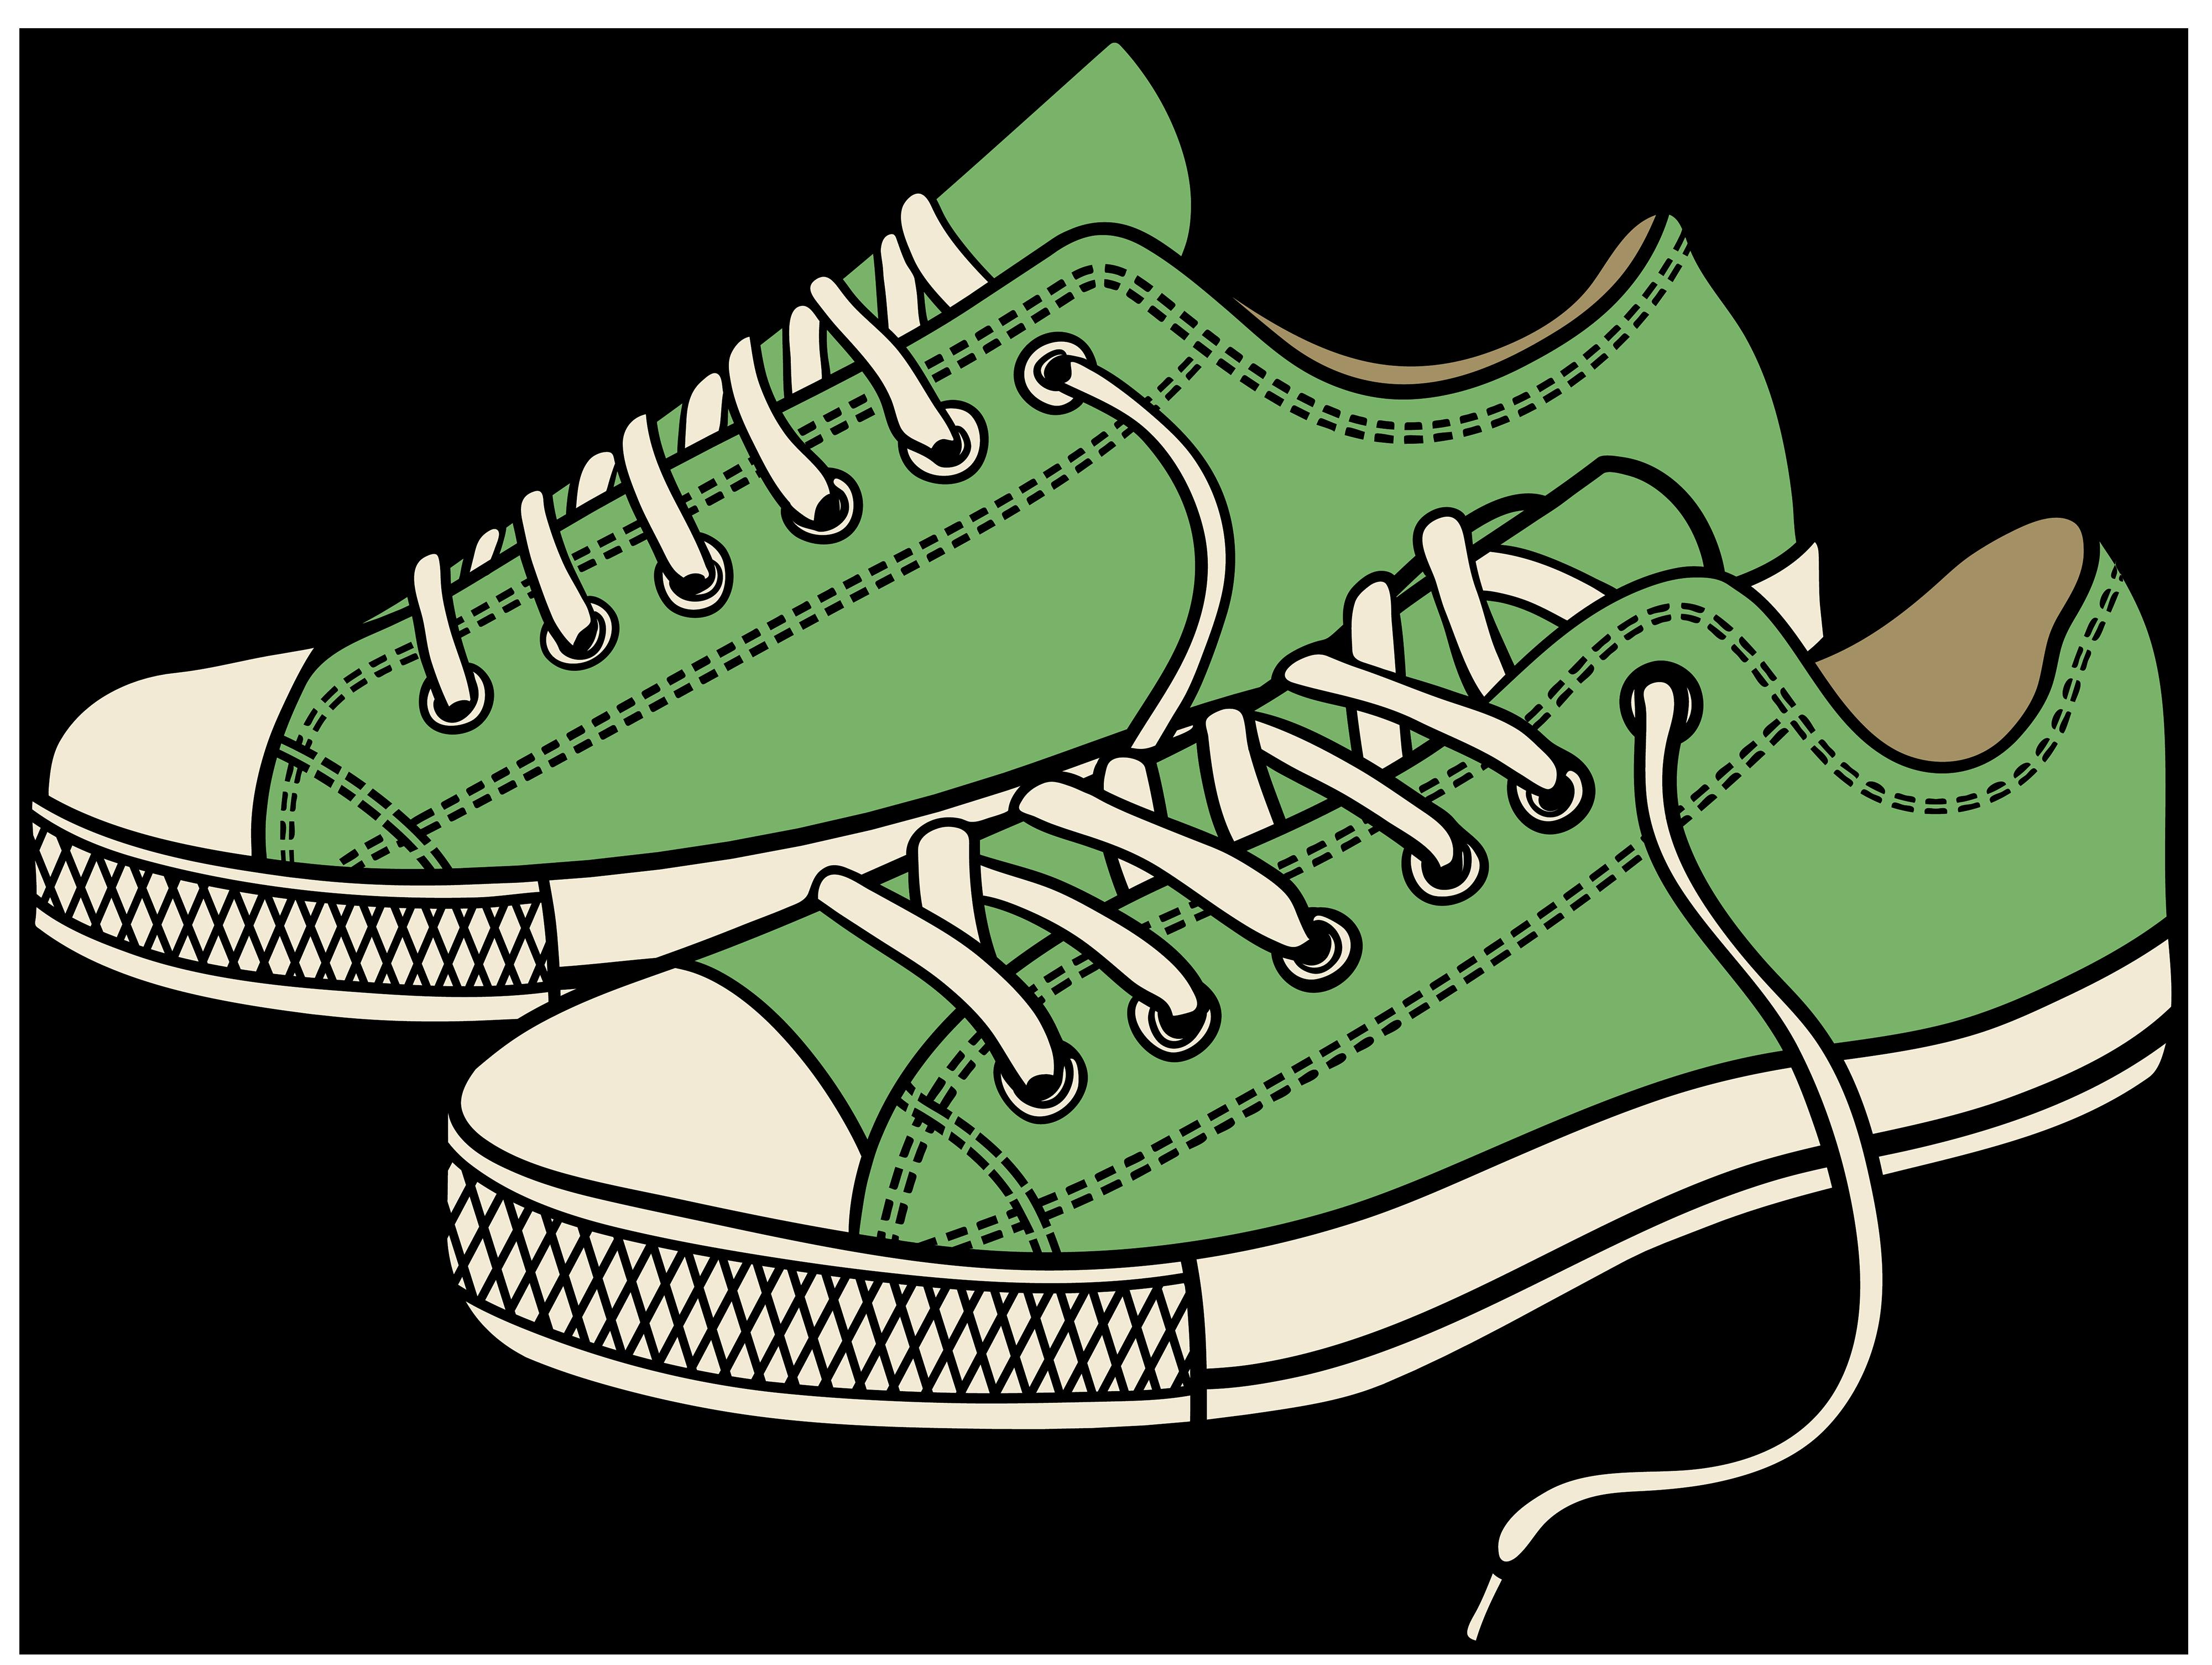 Sneakers Clip Art.